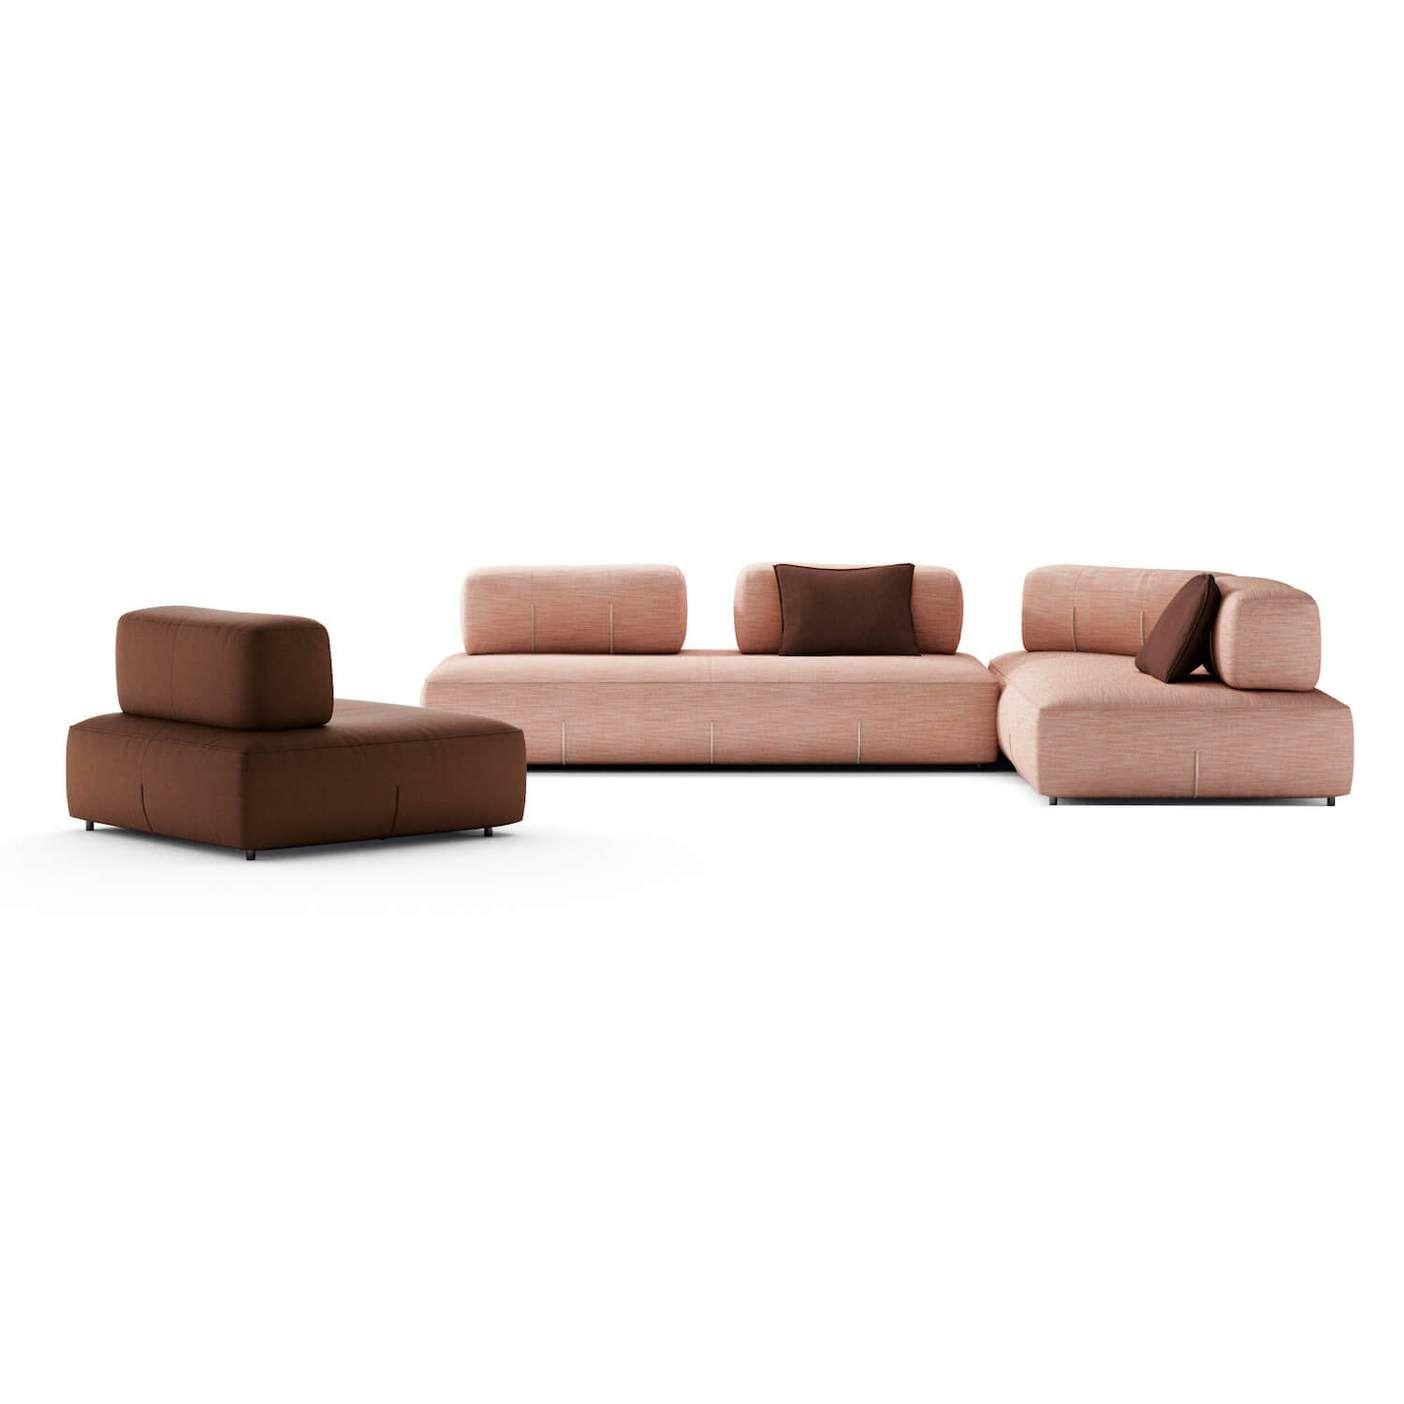 The Nobu Sofa Sectional Modern Relik Sectional Sofa Modern Sectional Timeless Sofa